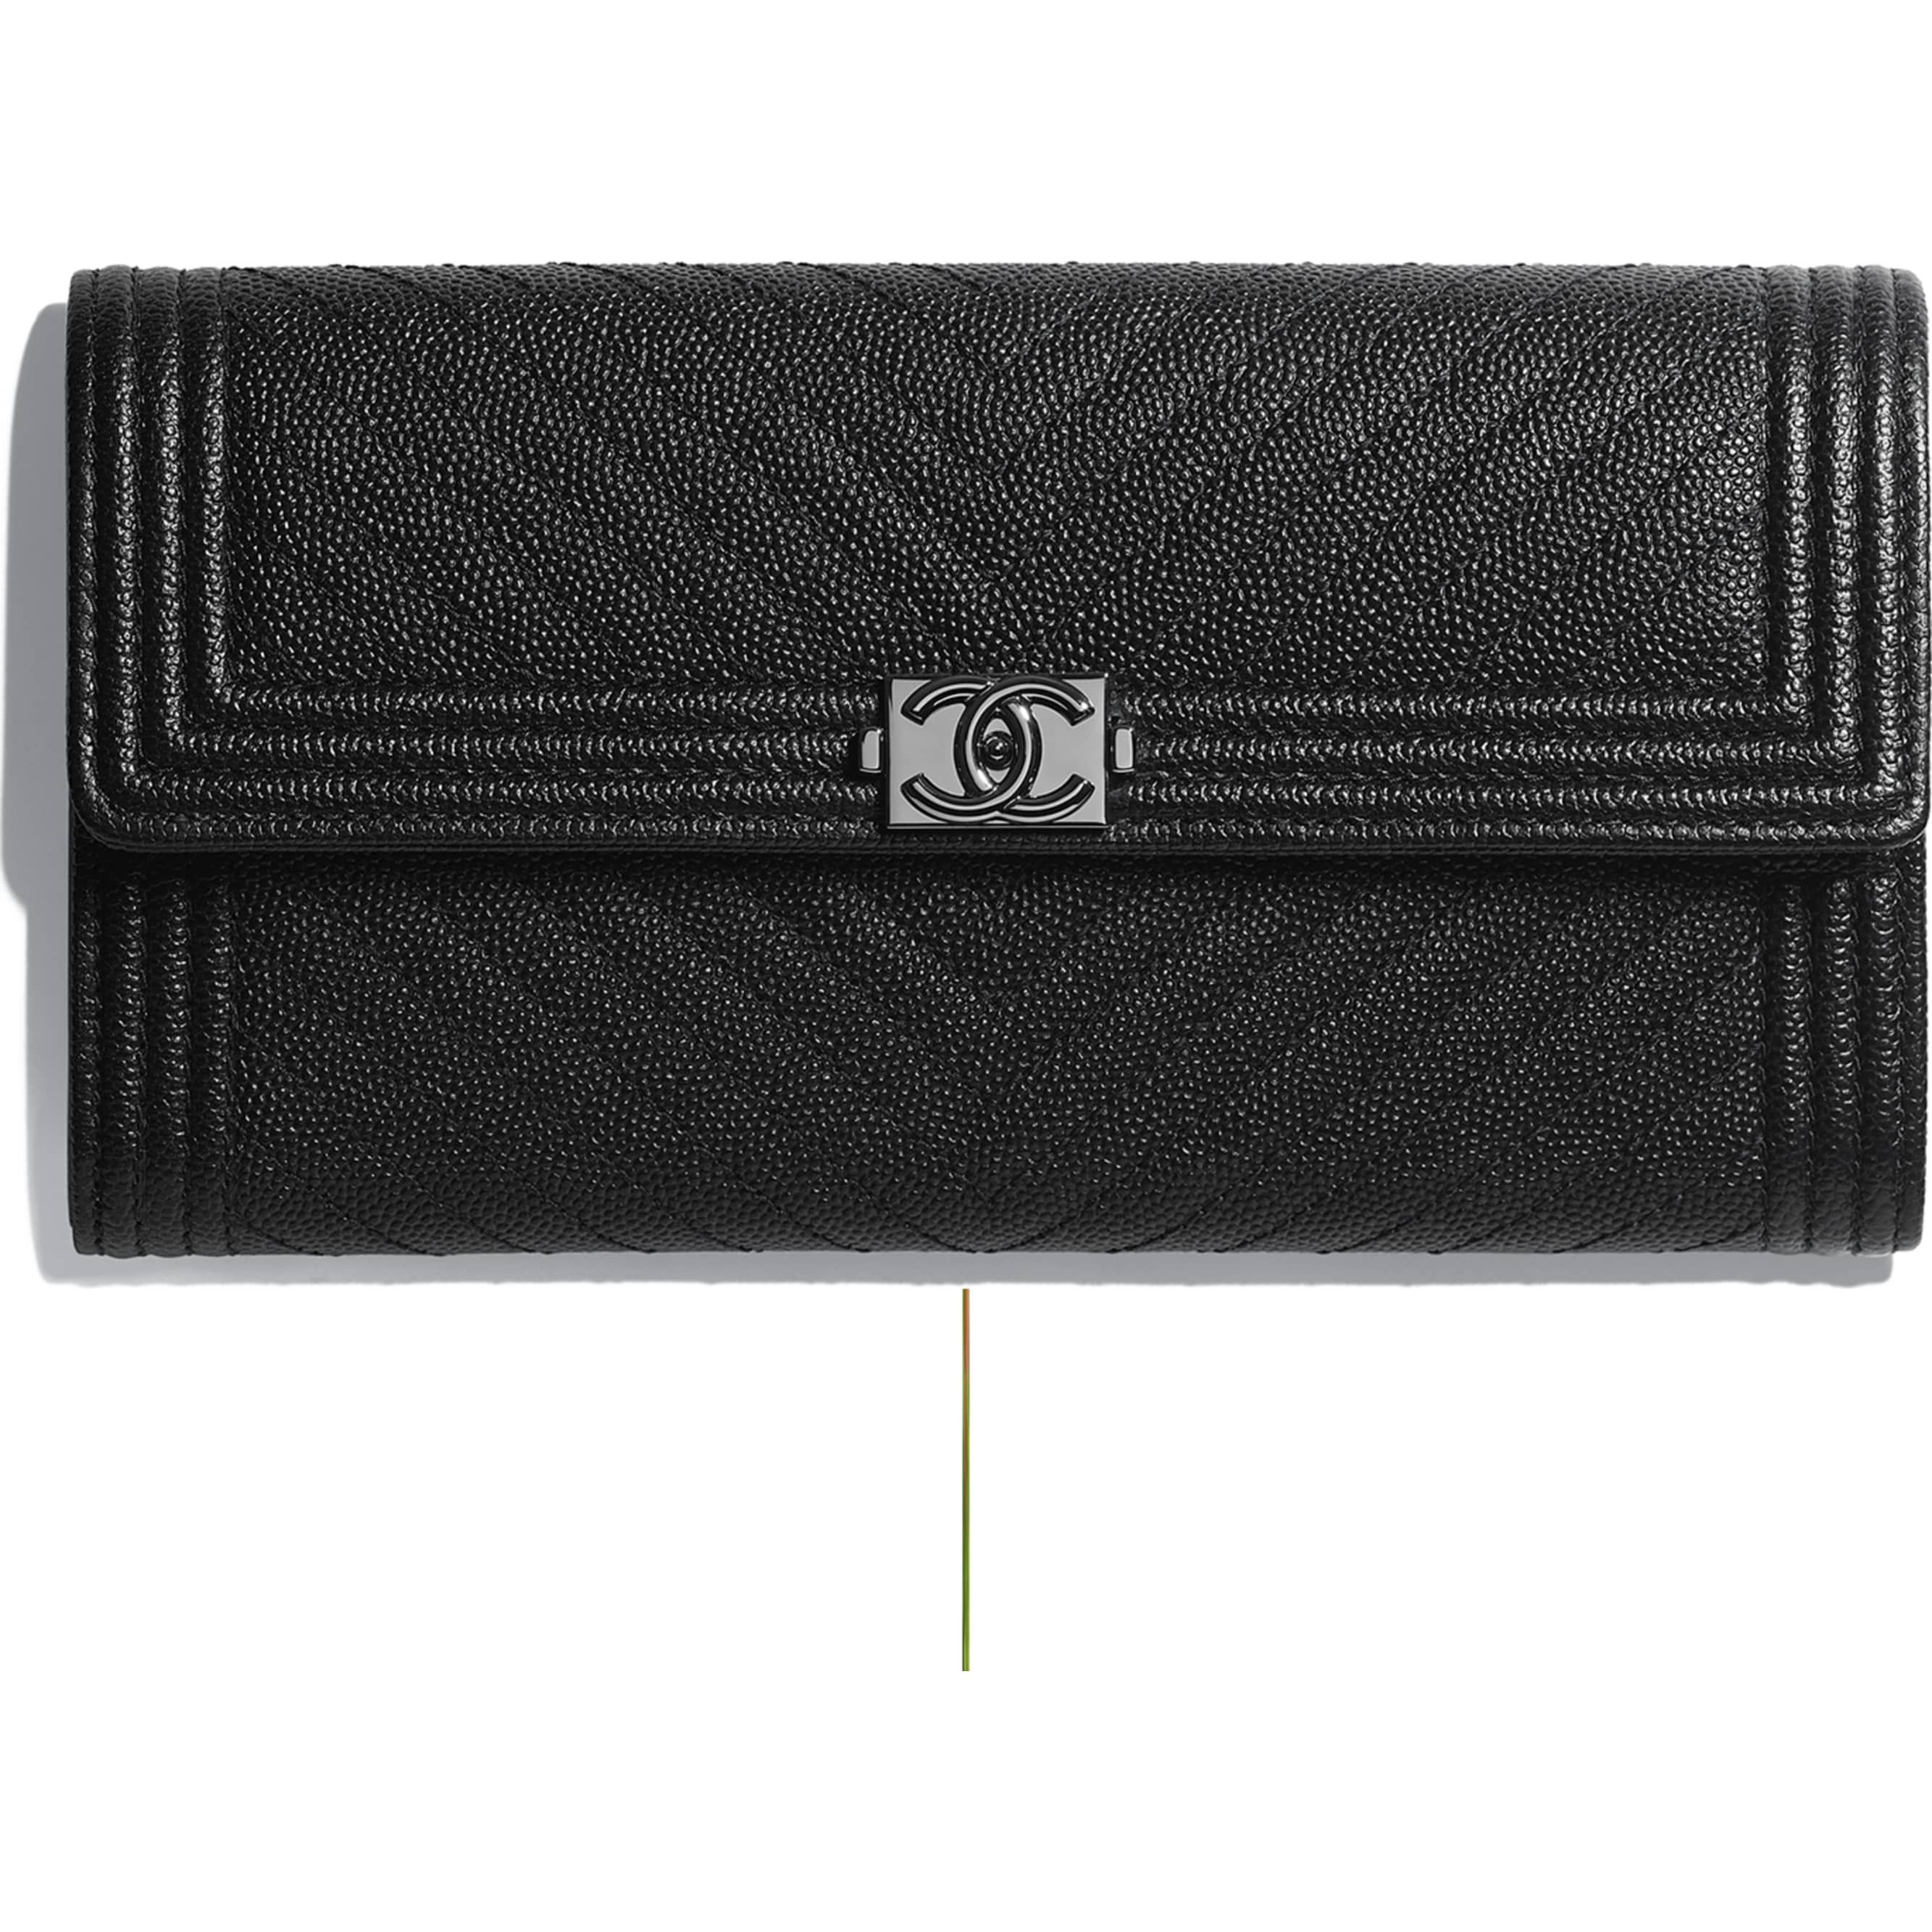 73f60af8e4f0 Grained Goatskin & Ruthenium-Tone Metal Black BOY CHANEL Flap Wallet |  CHANEL